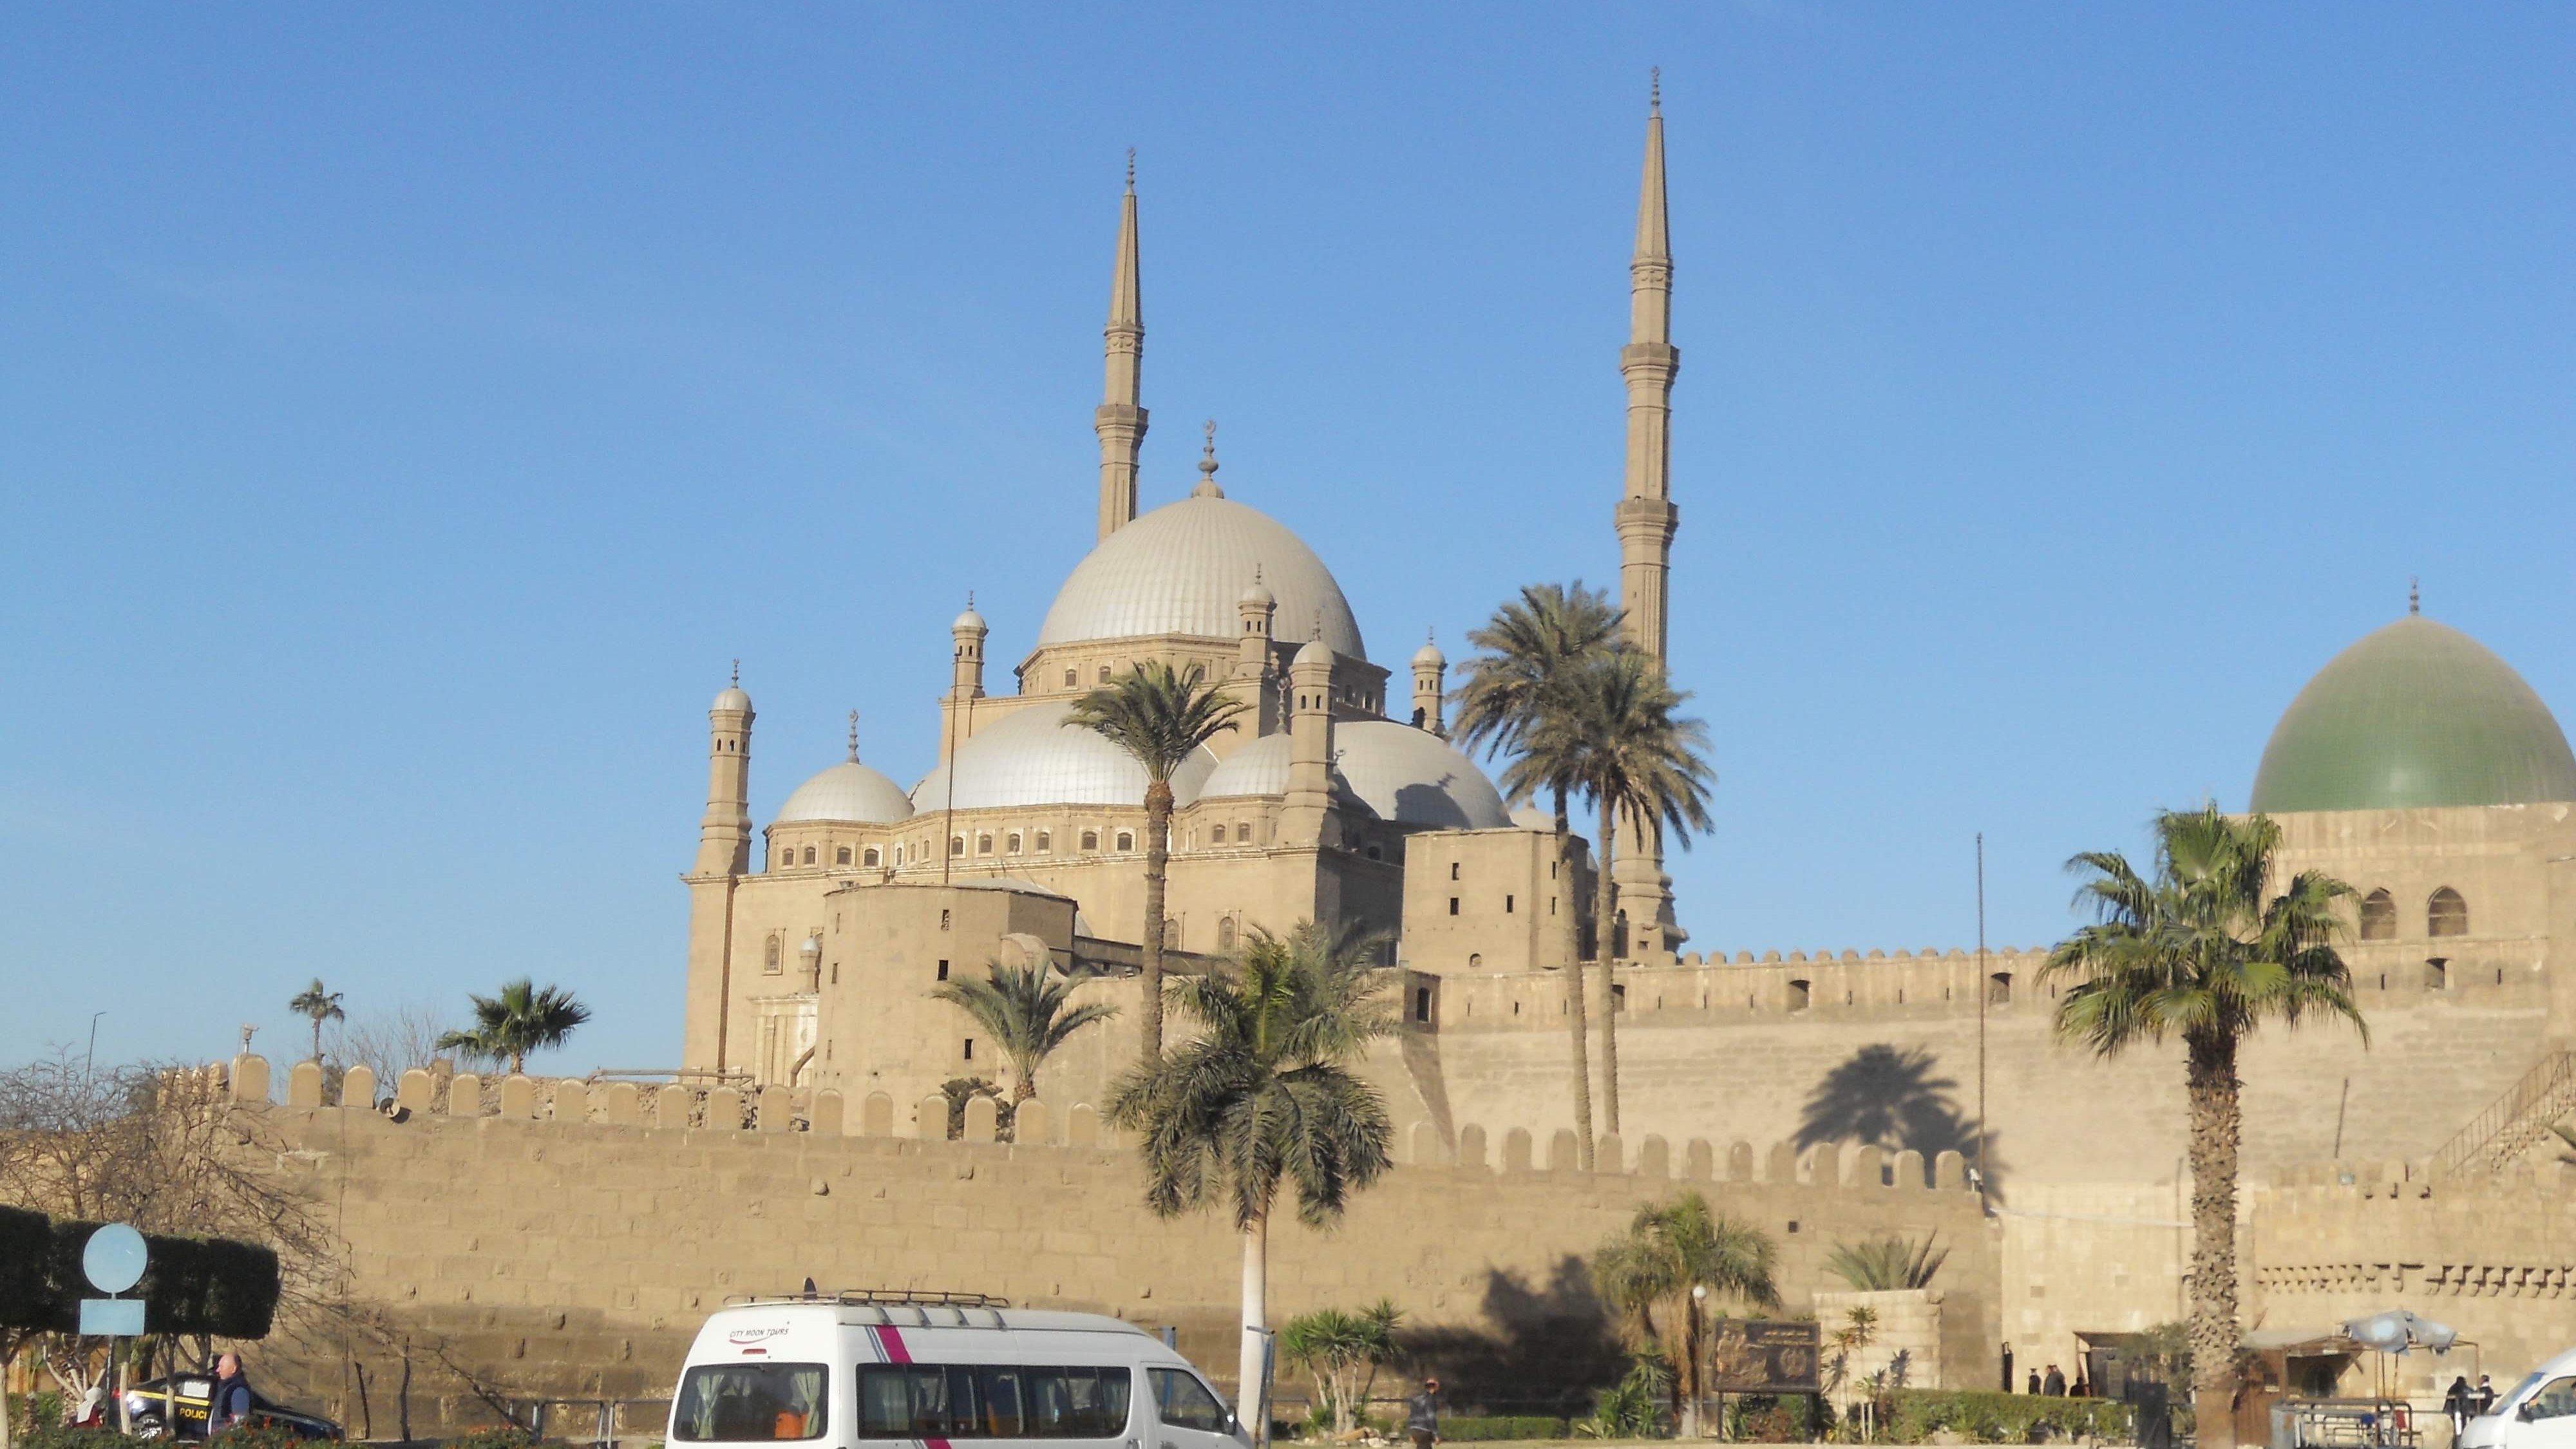 Поїздка Єгипетський музей Старий Каїр